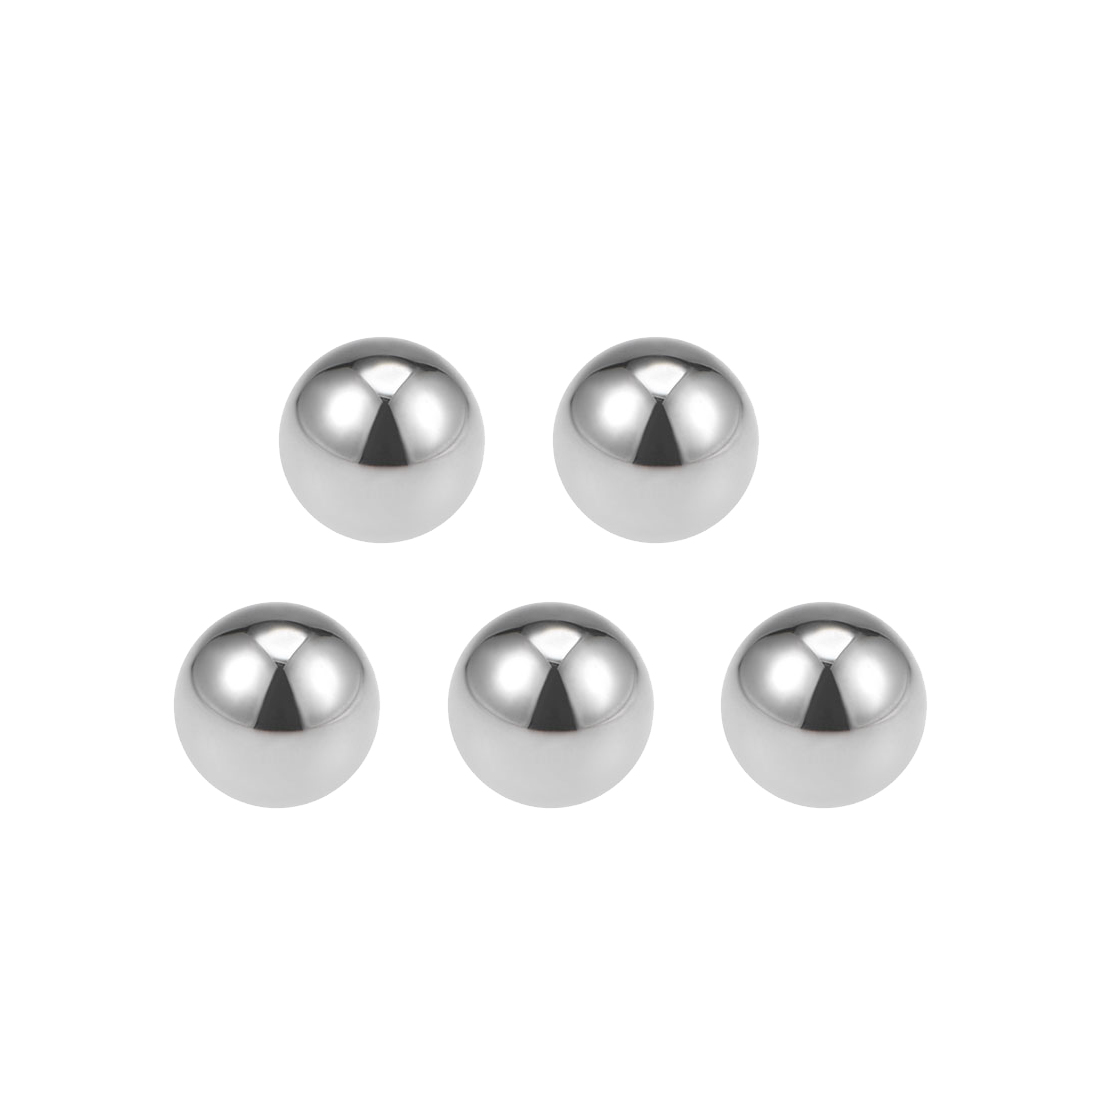 3mm Bearing Balls Tungsten Carbide G25 Precision Balls 10pcs